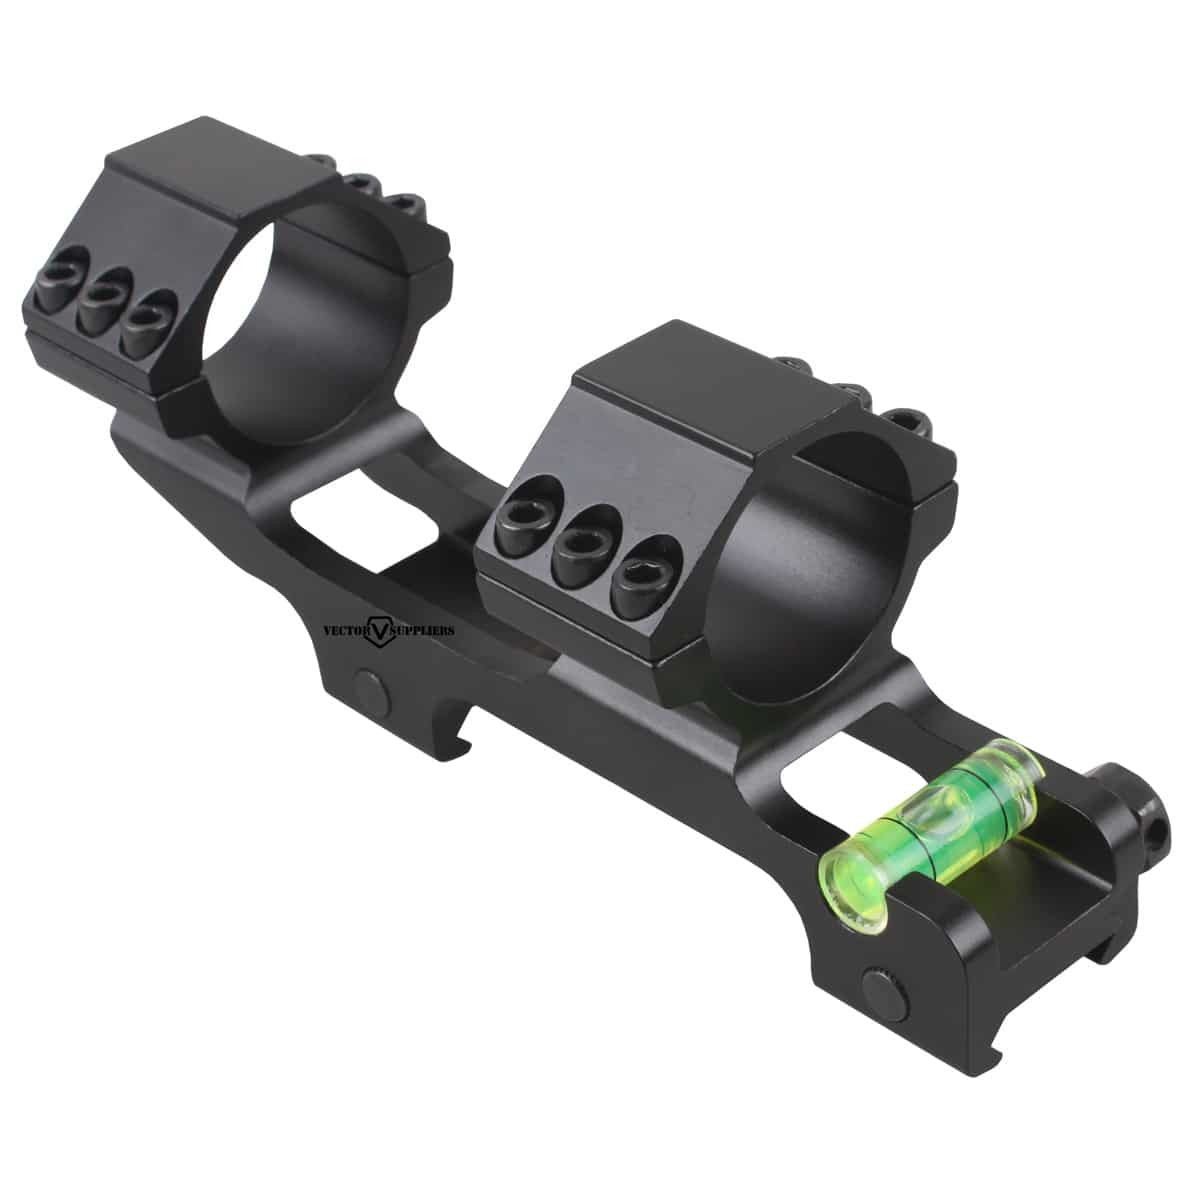 Vector Optics SCACD-08 30mm One Piece ACD Mount Extra Light